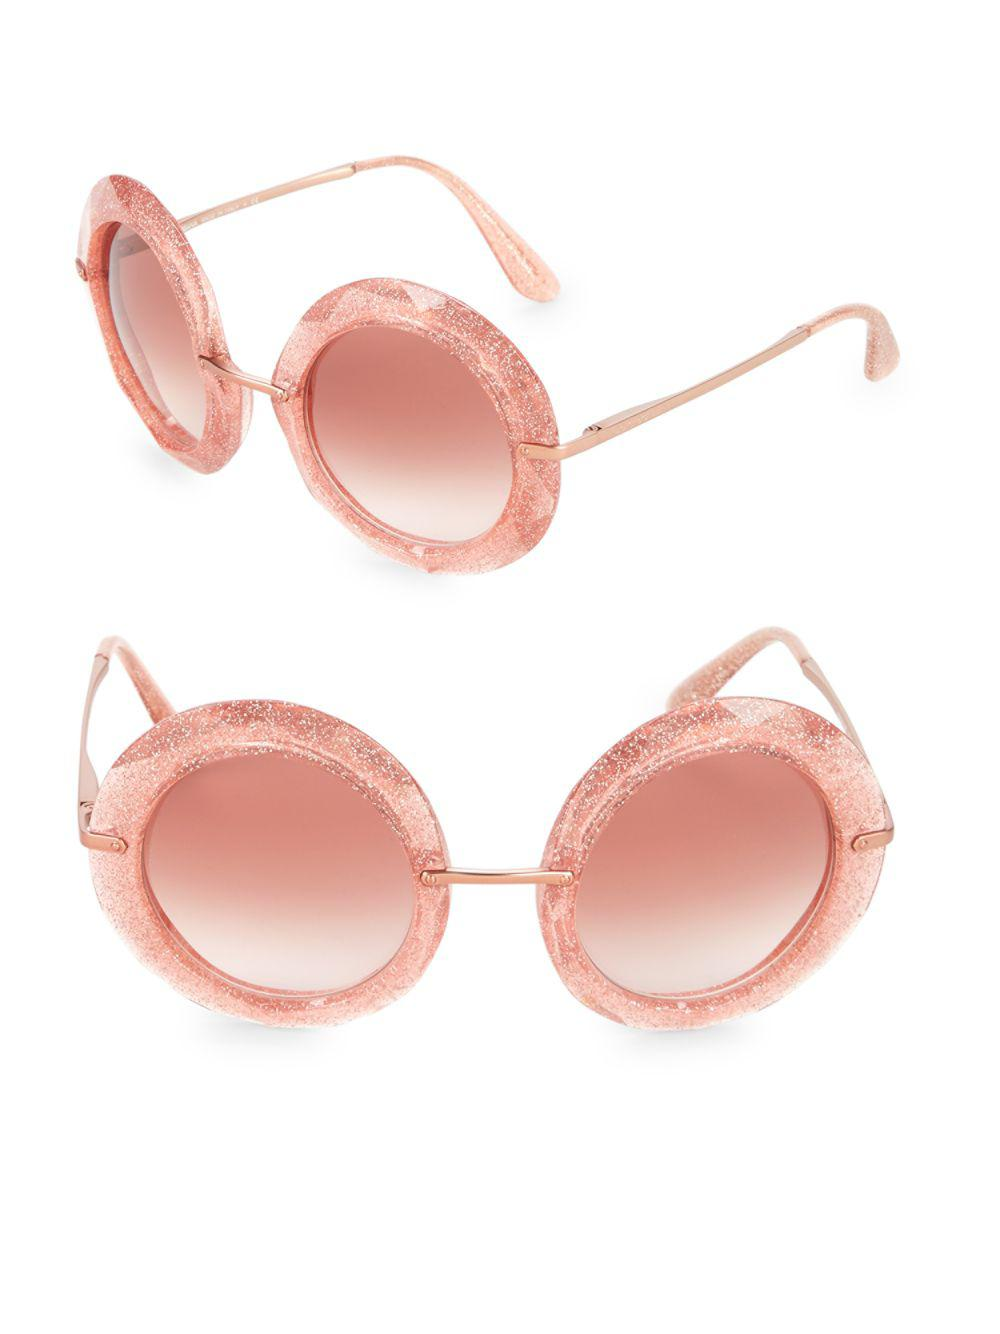 1066c4e1bc6f Dolce   Gabbana 50mm Glittered Round Sunglasses in Pink - Lyst